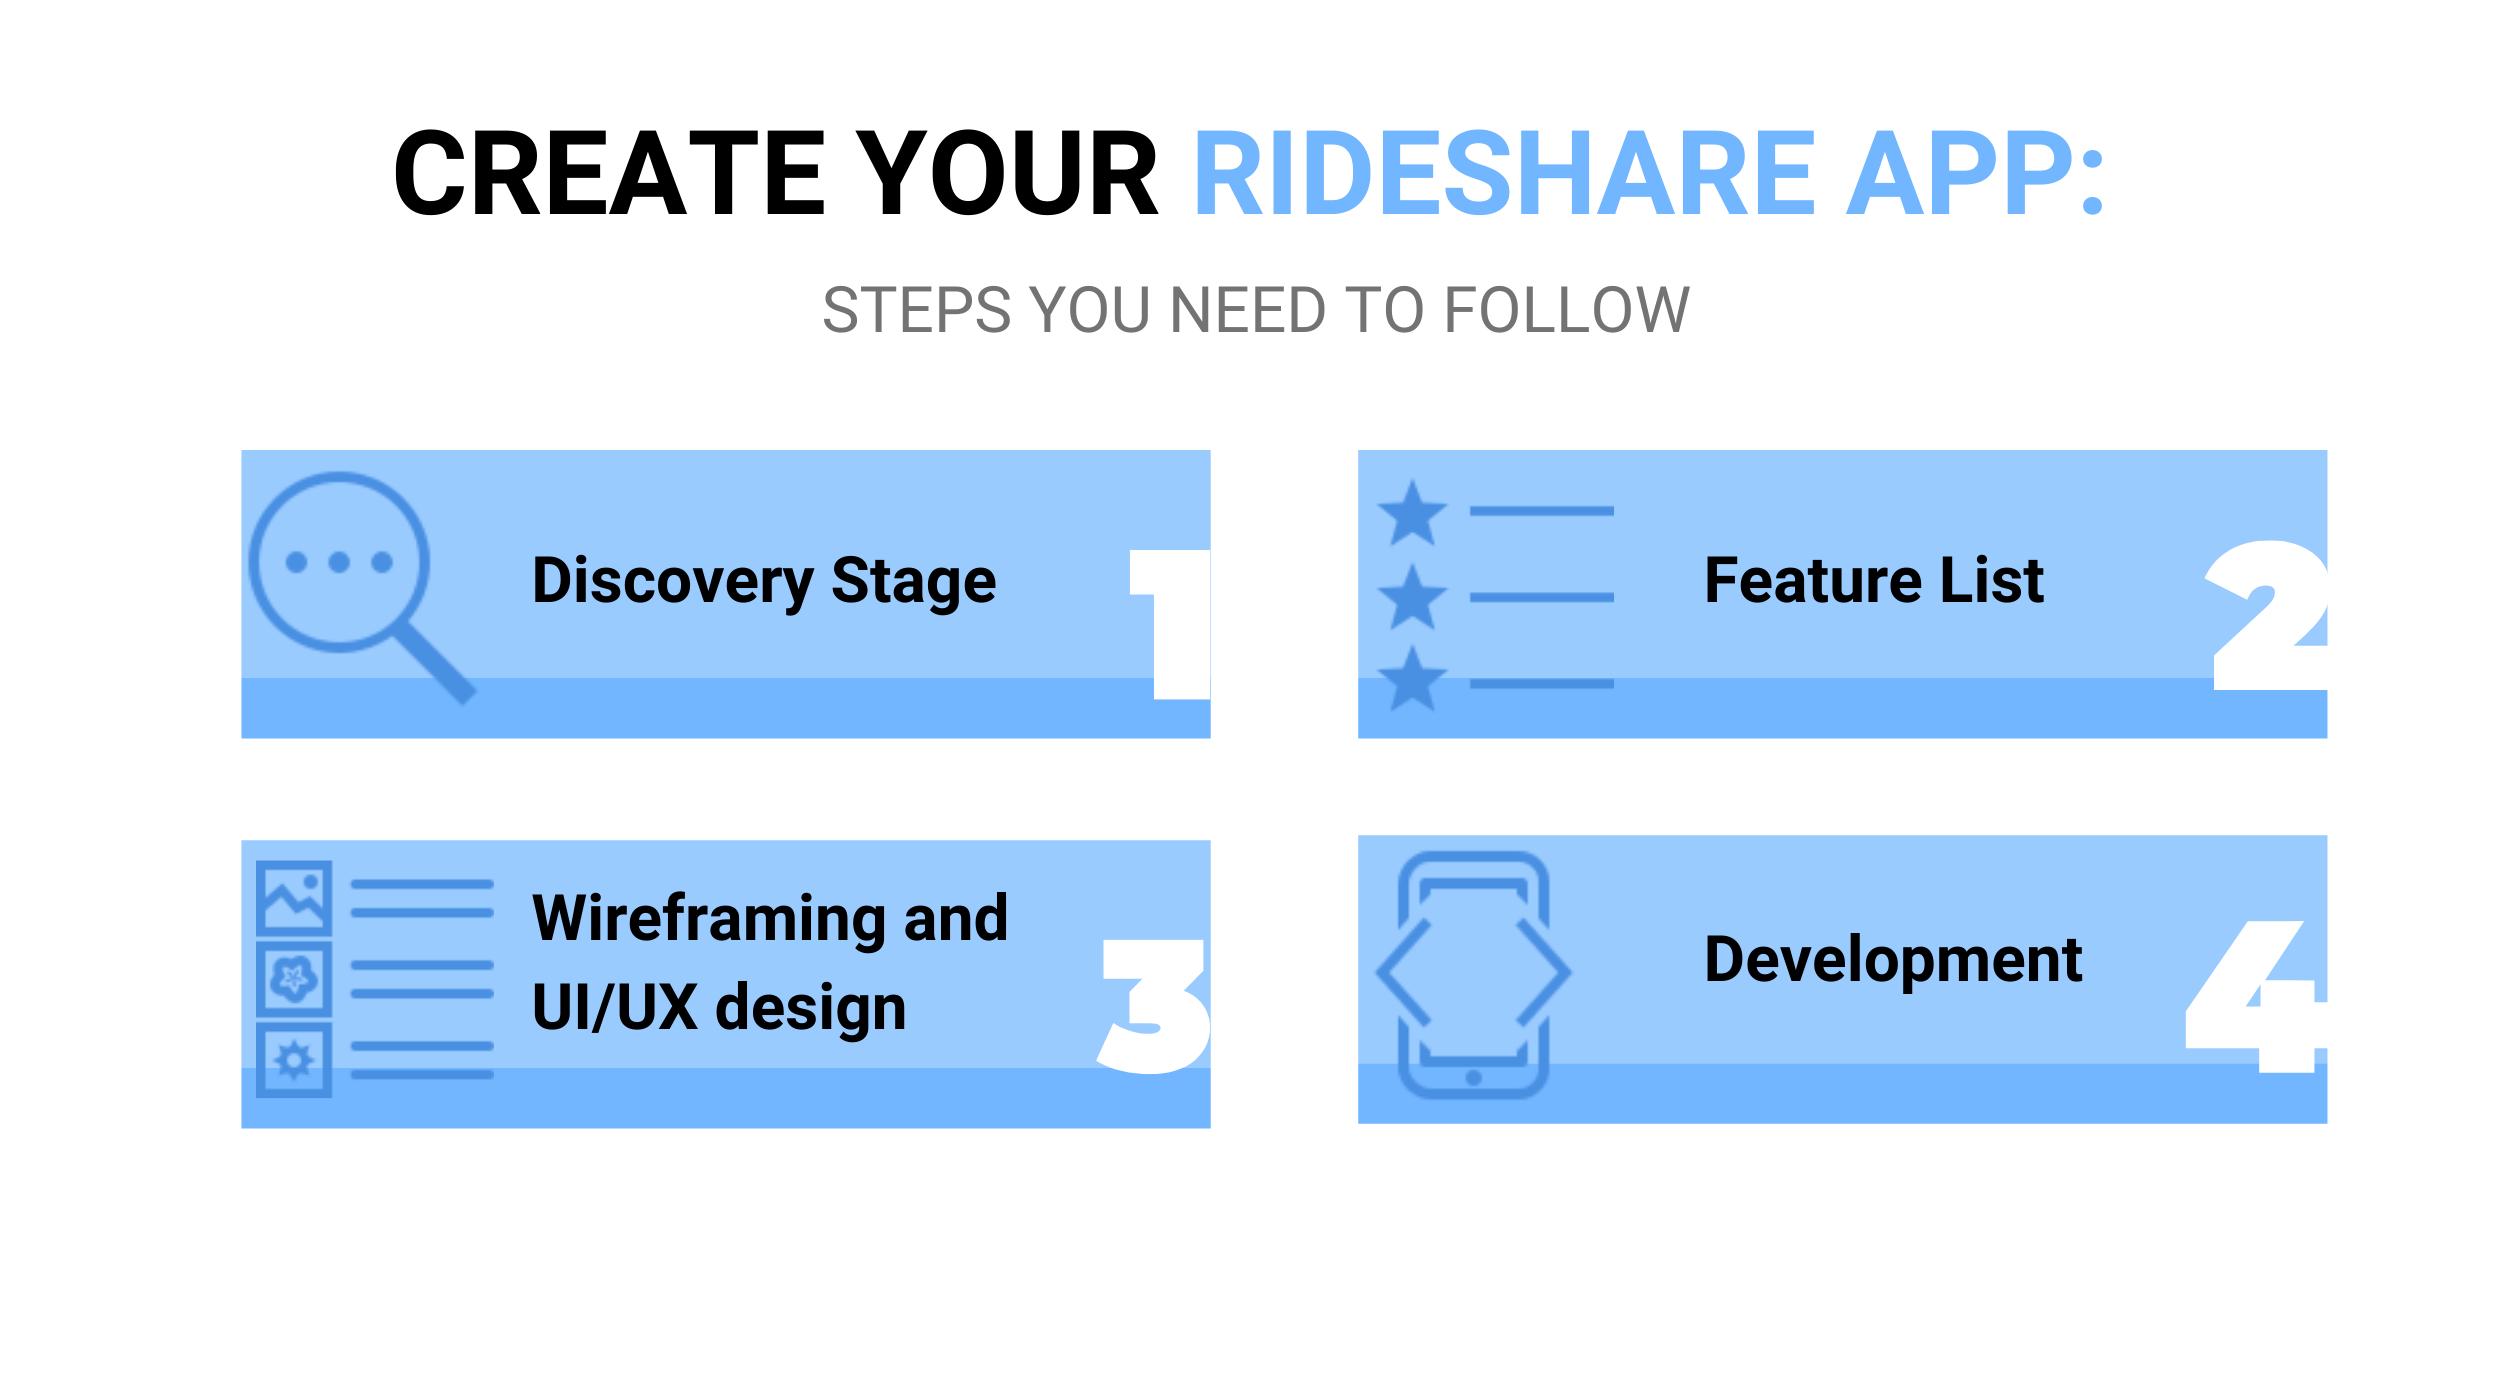 Create your rideshare app